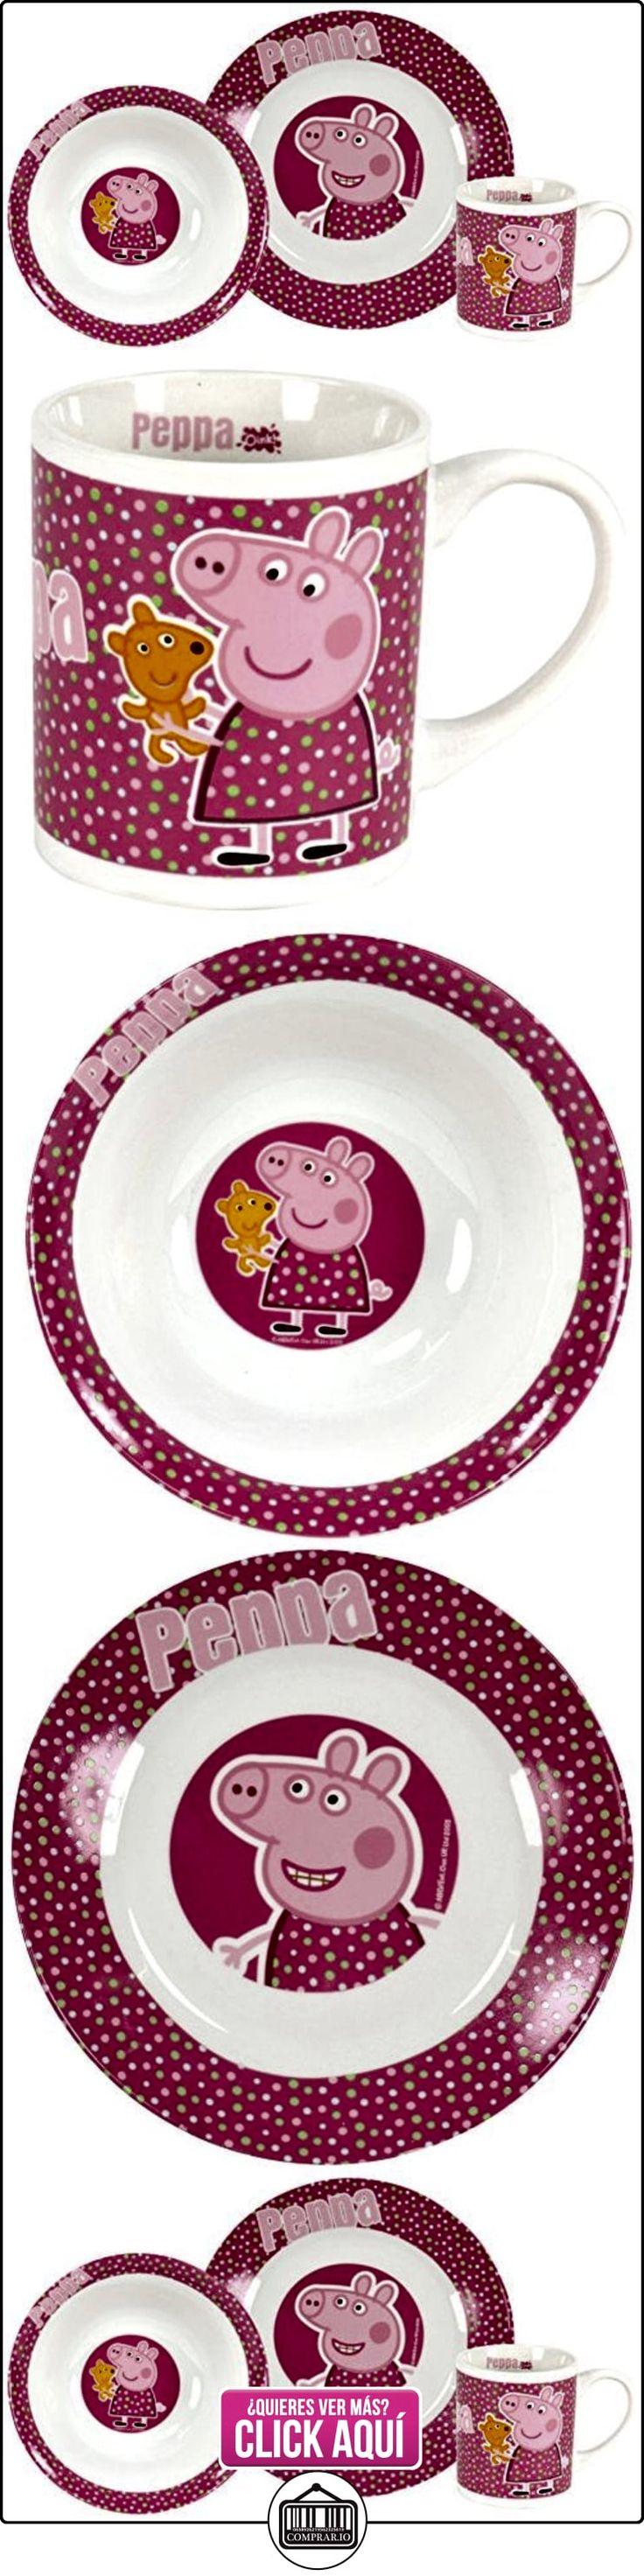 Peppa Pig - Set de desayuno porcelana: plato, bol y taza, color rosa (United Labels 810552)  ✿ Peppa Pig - Peppa La Cerdita ✿ ▬► Ver oferta: https://comprar.io/goto/B00DYRSD00